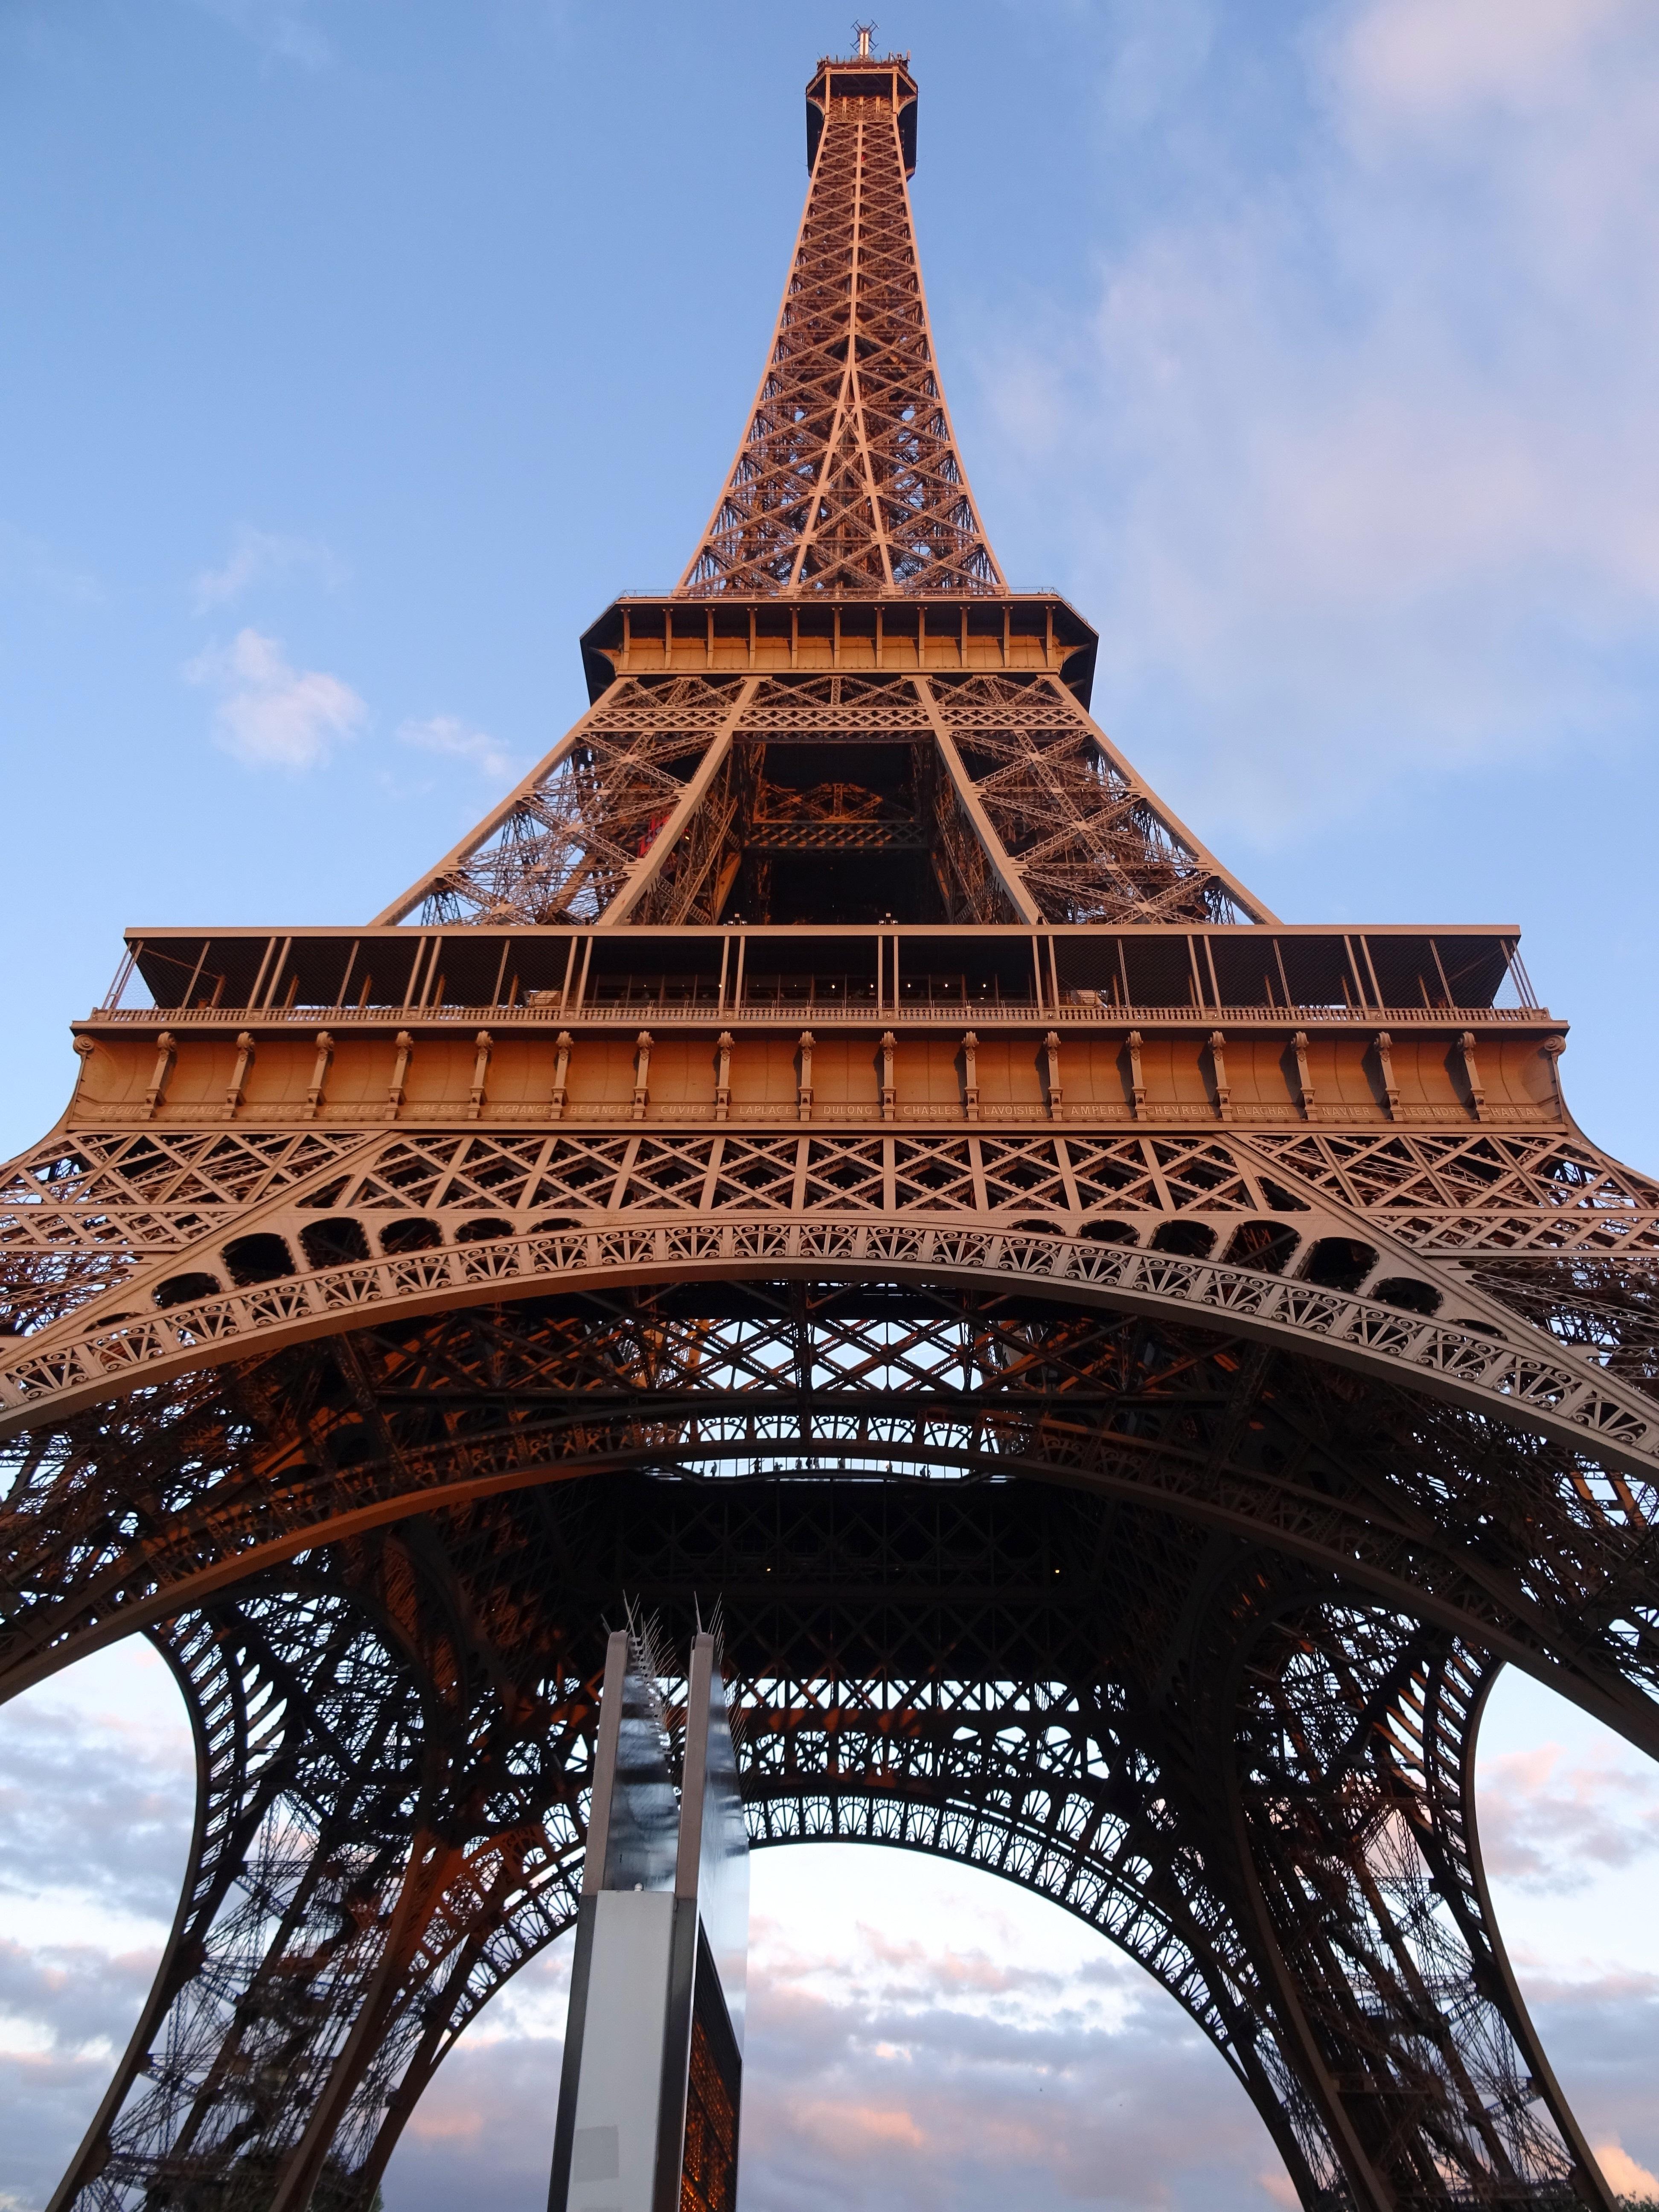 Sky Eiffel Tower Paris France Europe Landmark Tourism Temple Famous Chinese Architecture Pagoda Ancient